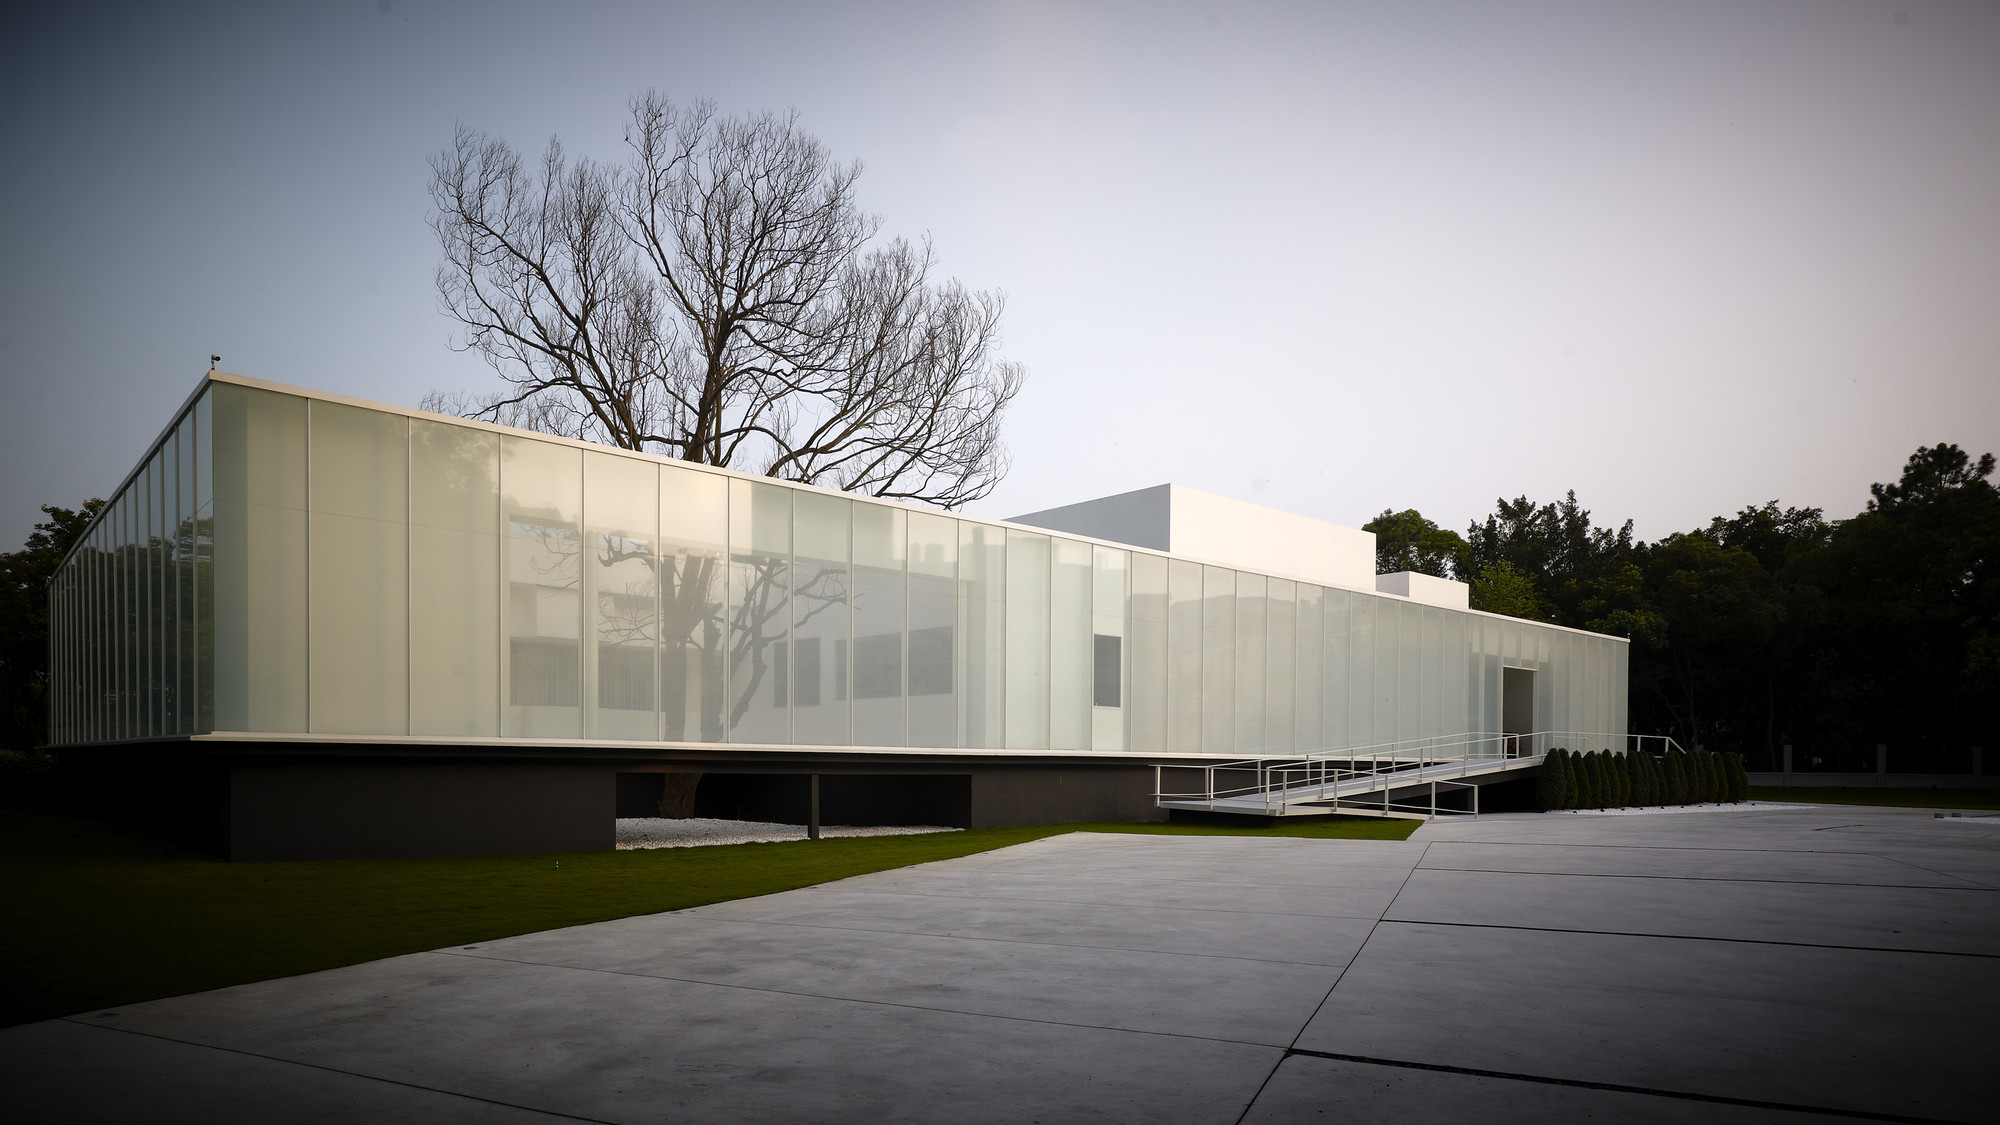 Galer a de lightbox hsuyuan kuo architect associates 1 for Architect associates